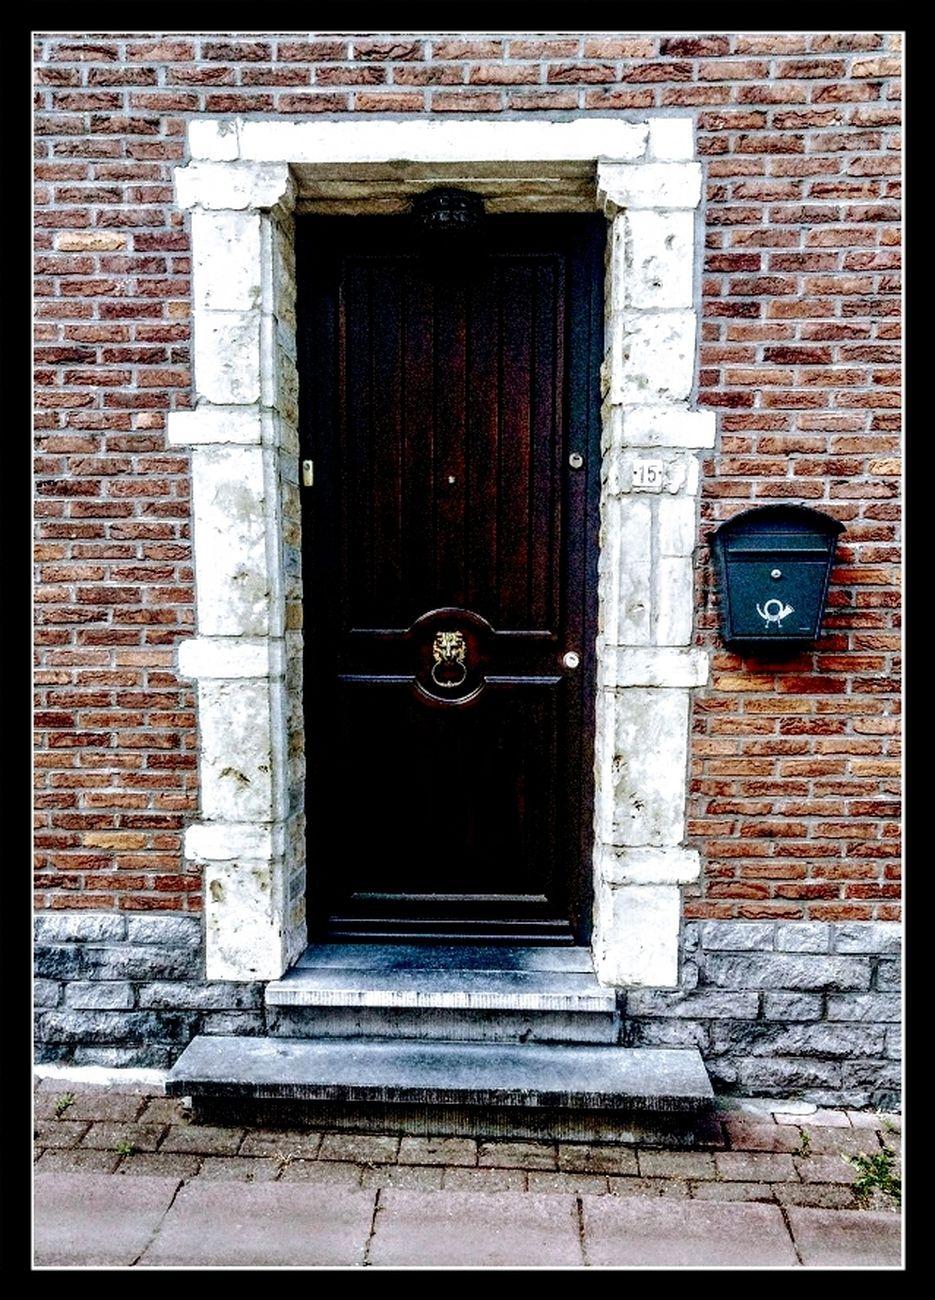 I always love how people used to decorate the doors and doors. Vanddar this new series. Sincerely Theo-Herbots-Photography https://groetenuittienen.blog/